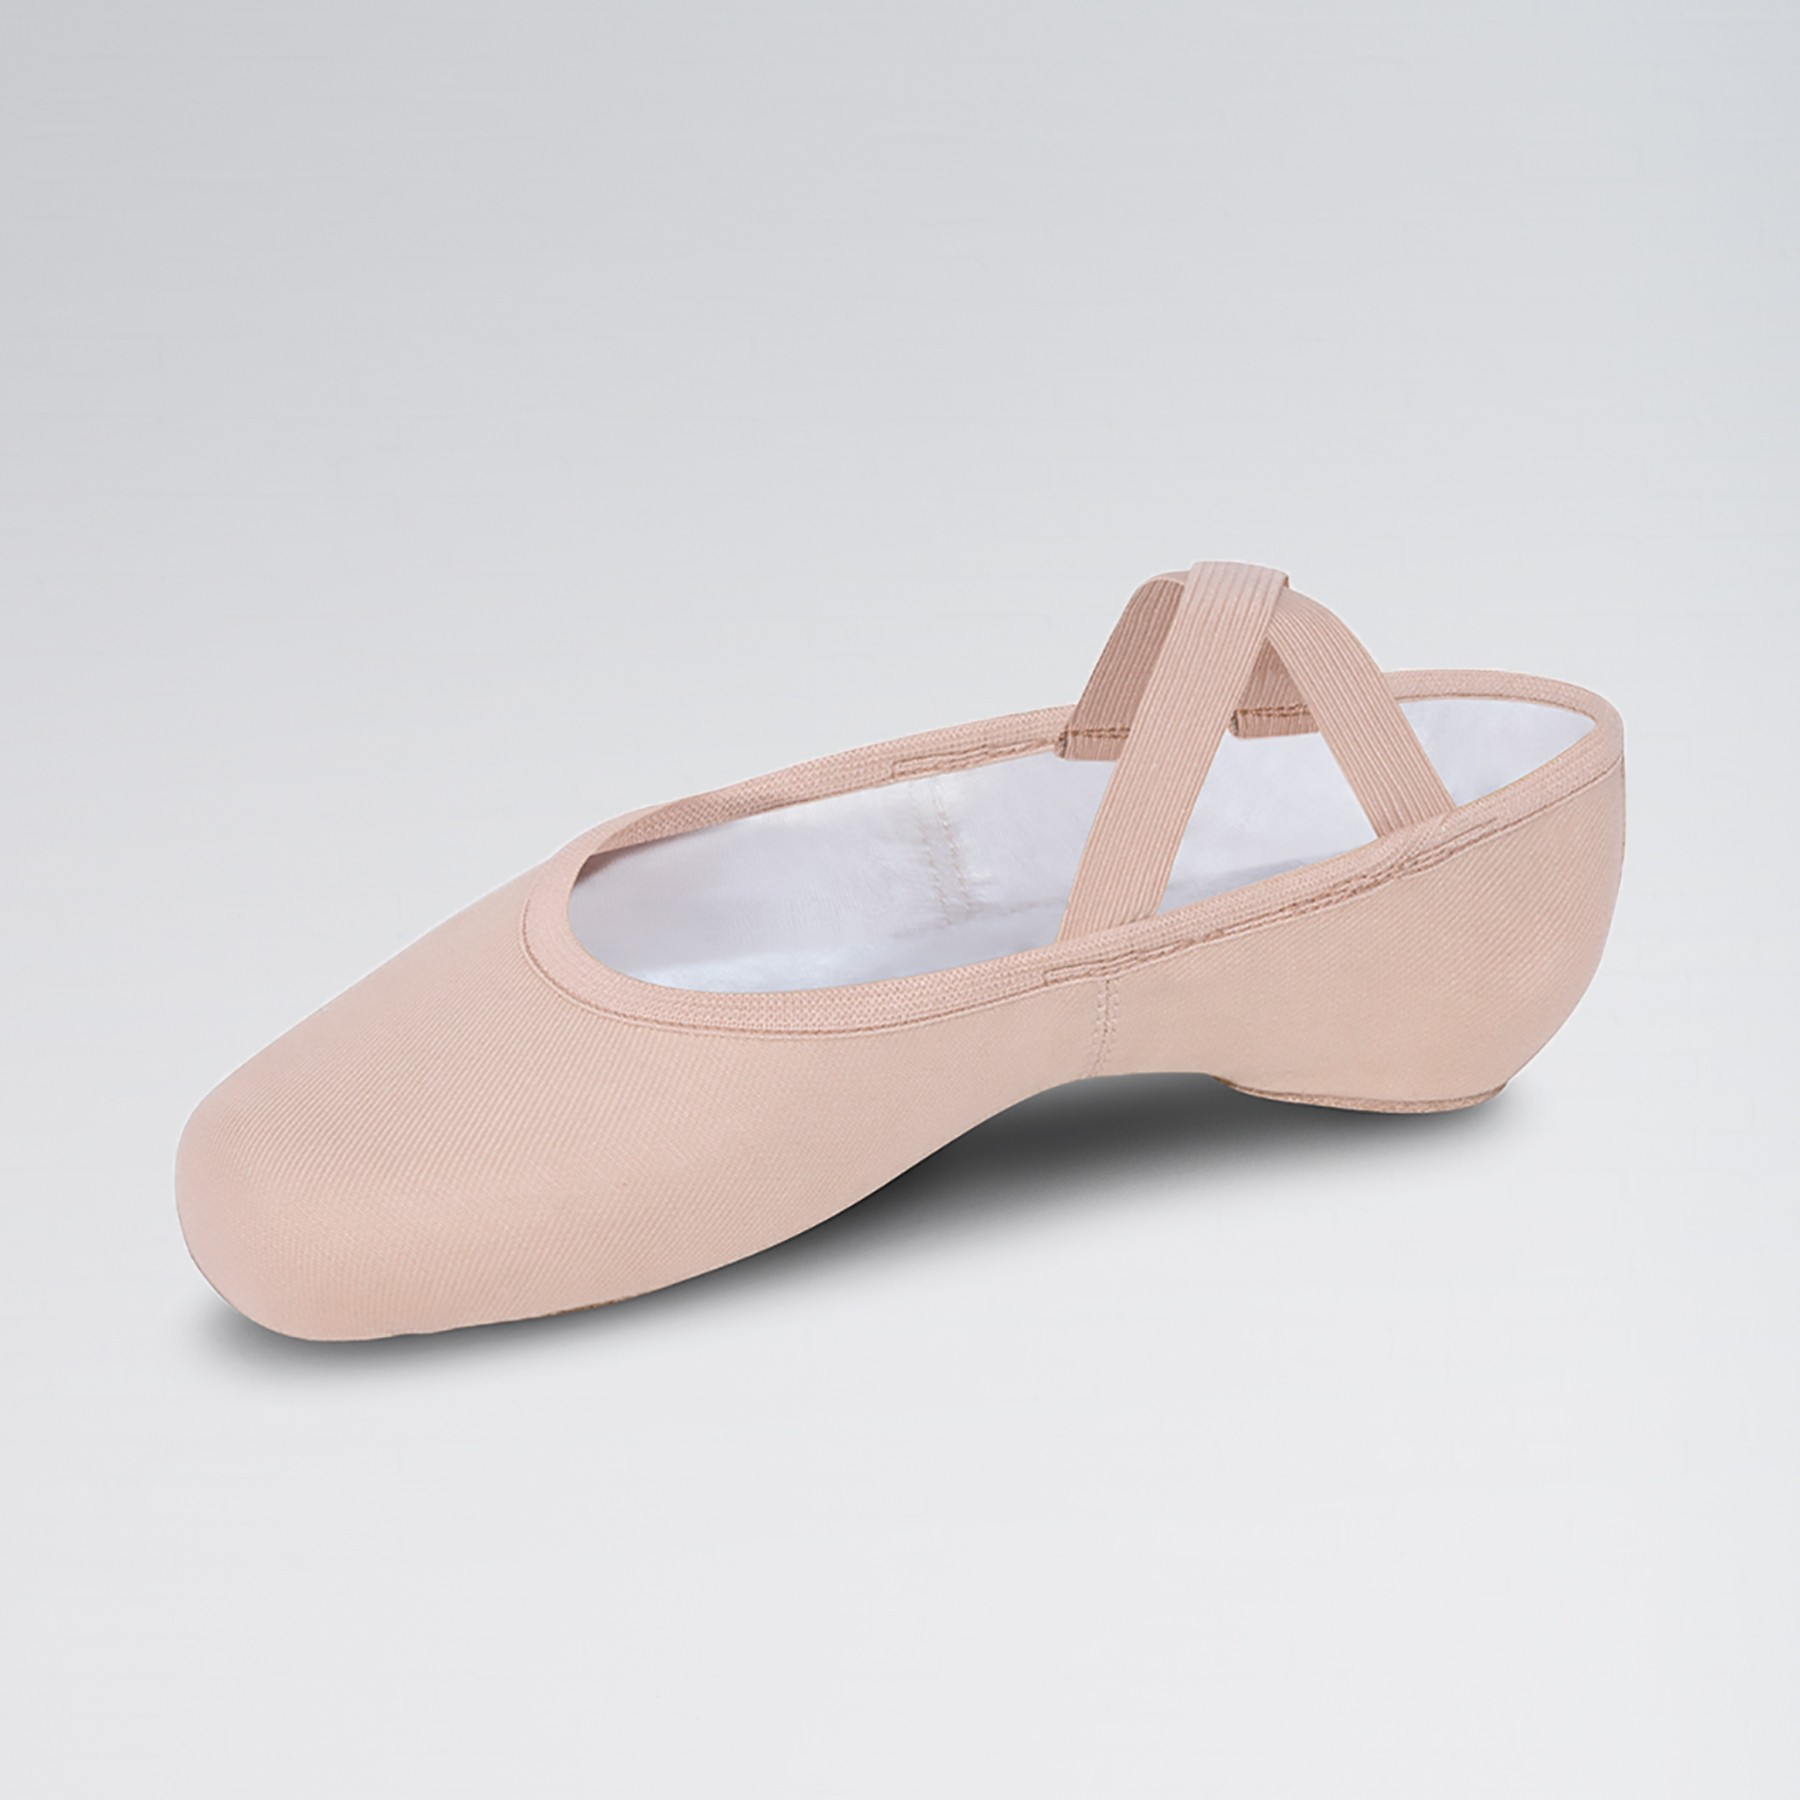 Bloch Performa Stretch Canvas Split Sole Ballet Shoe (Theatrical Pink)